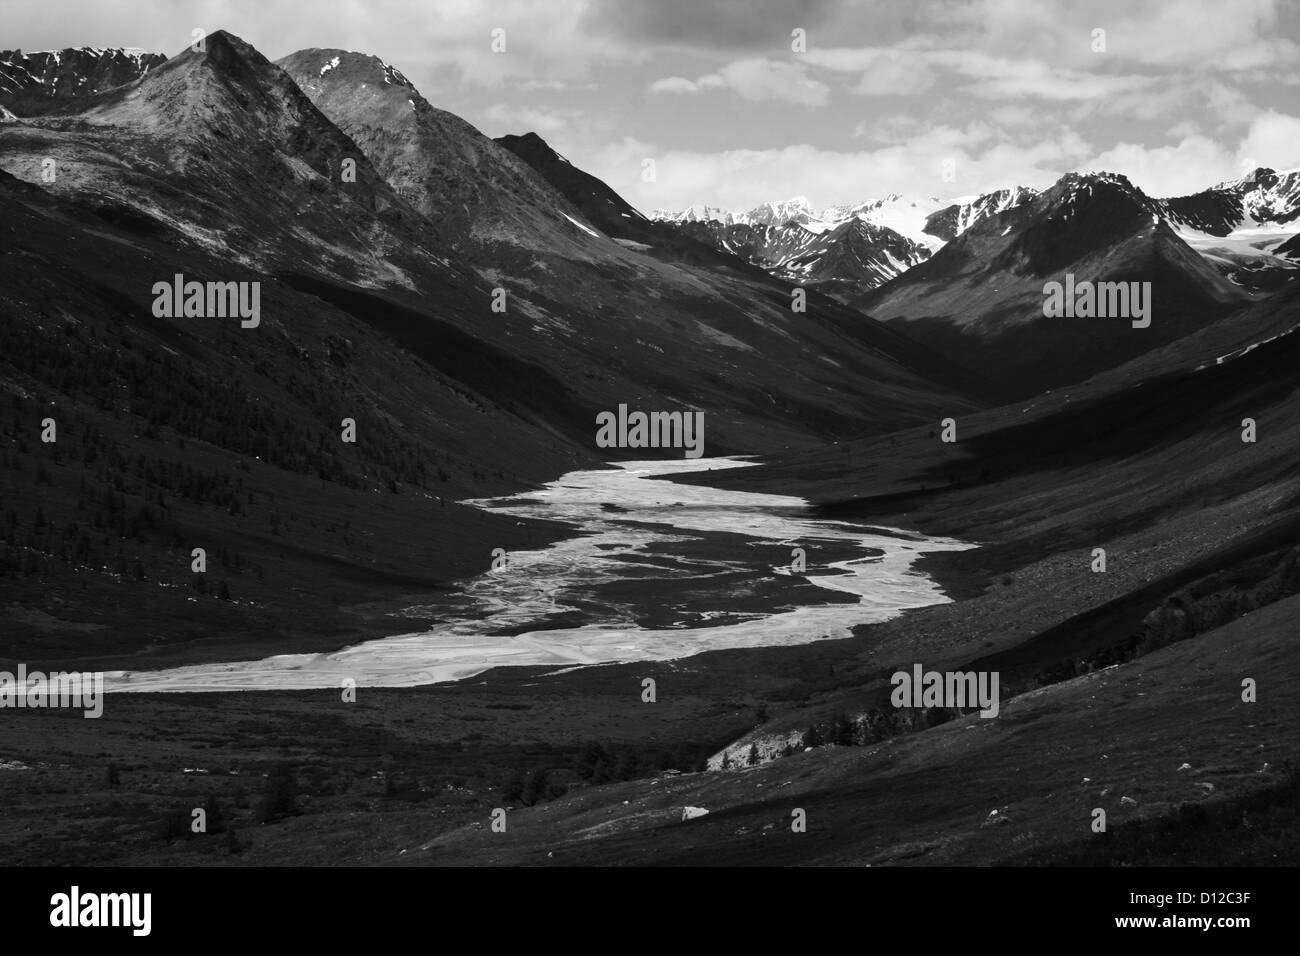 Tsagaan Us Gol (white water river), Altai Tavan Bogd National Park - Stock Image